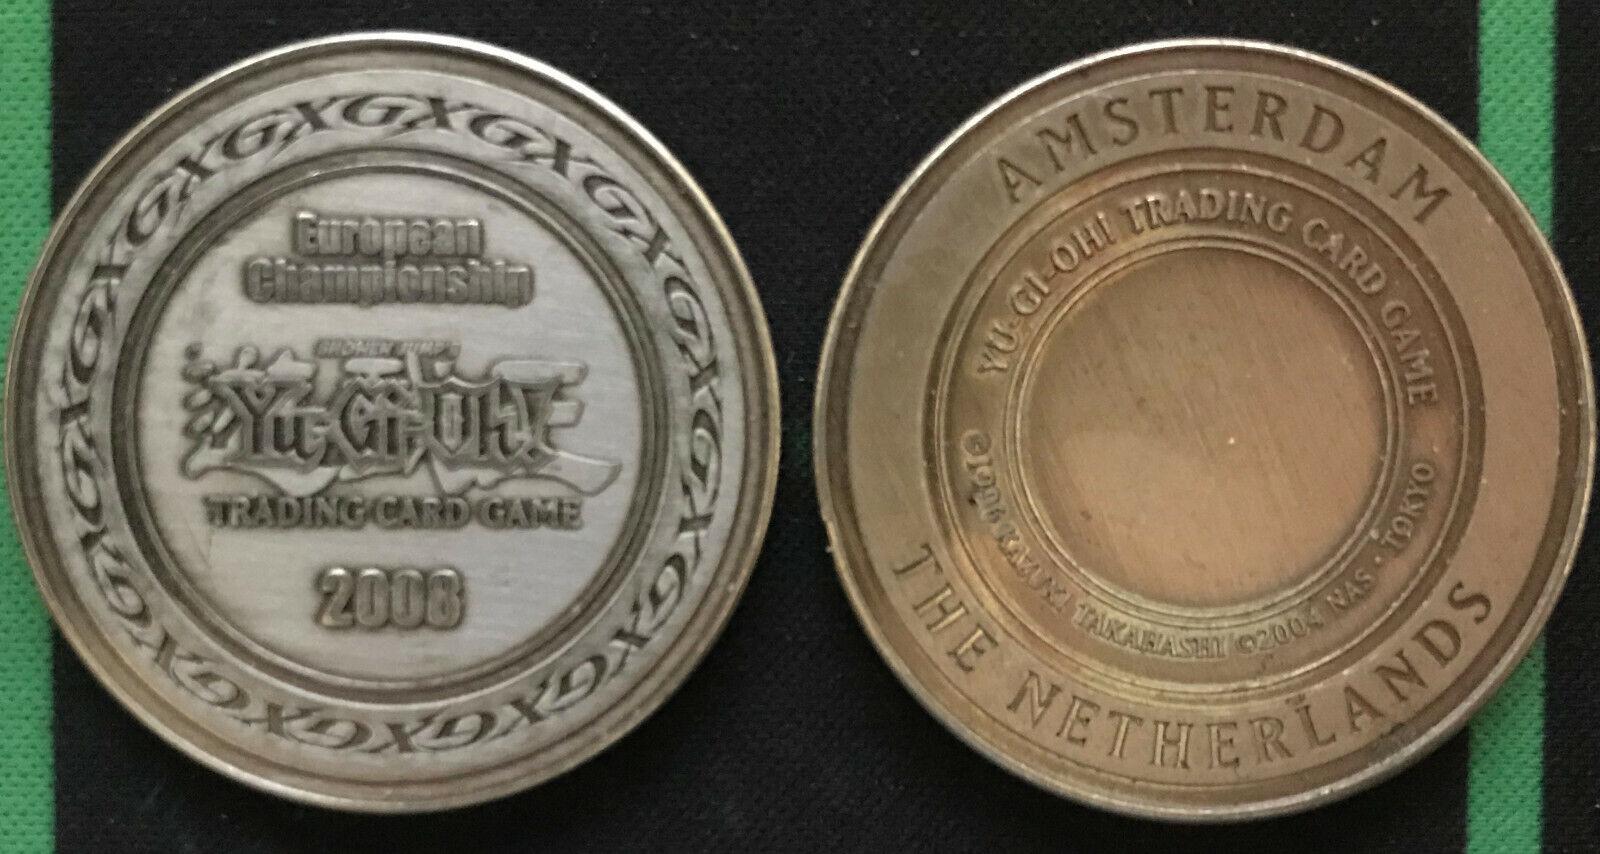 Coin Album with 3 coins FANATTIK OVP Yu-Gi-Oh!